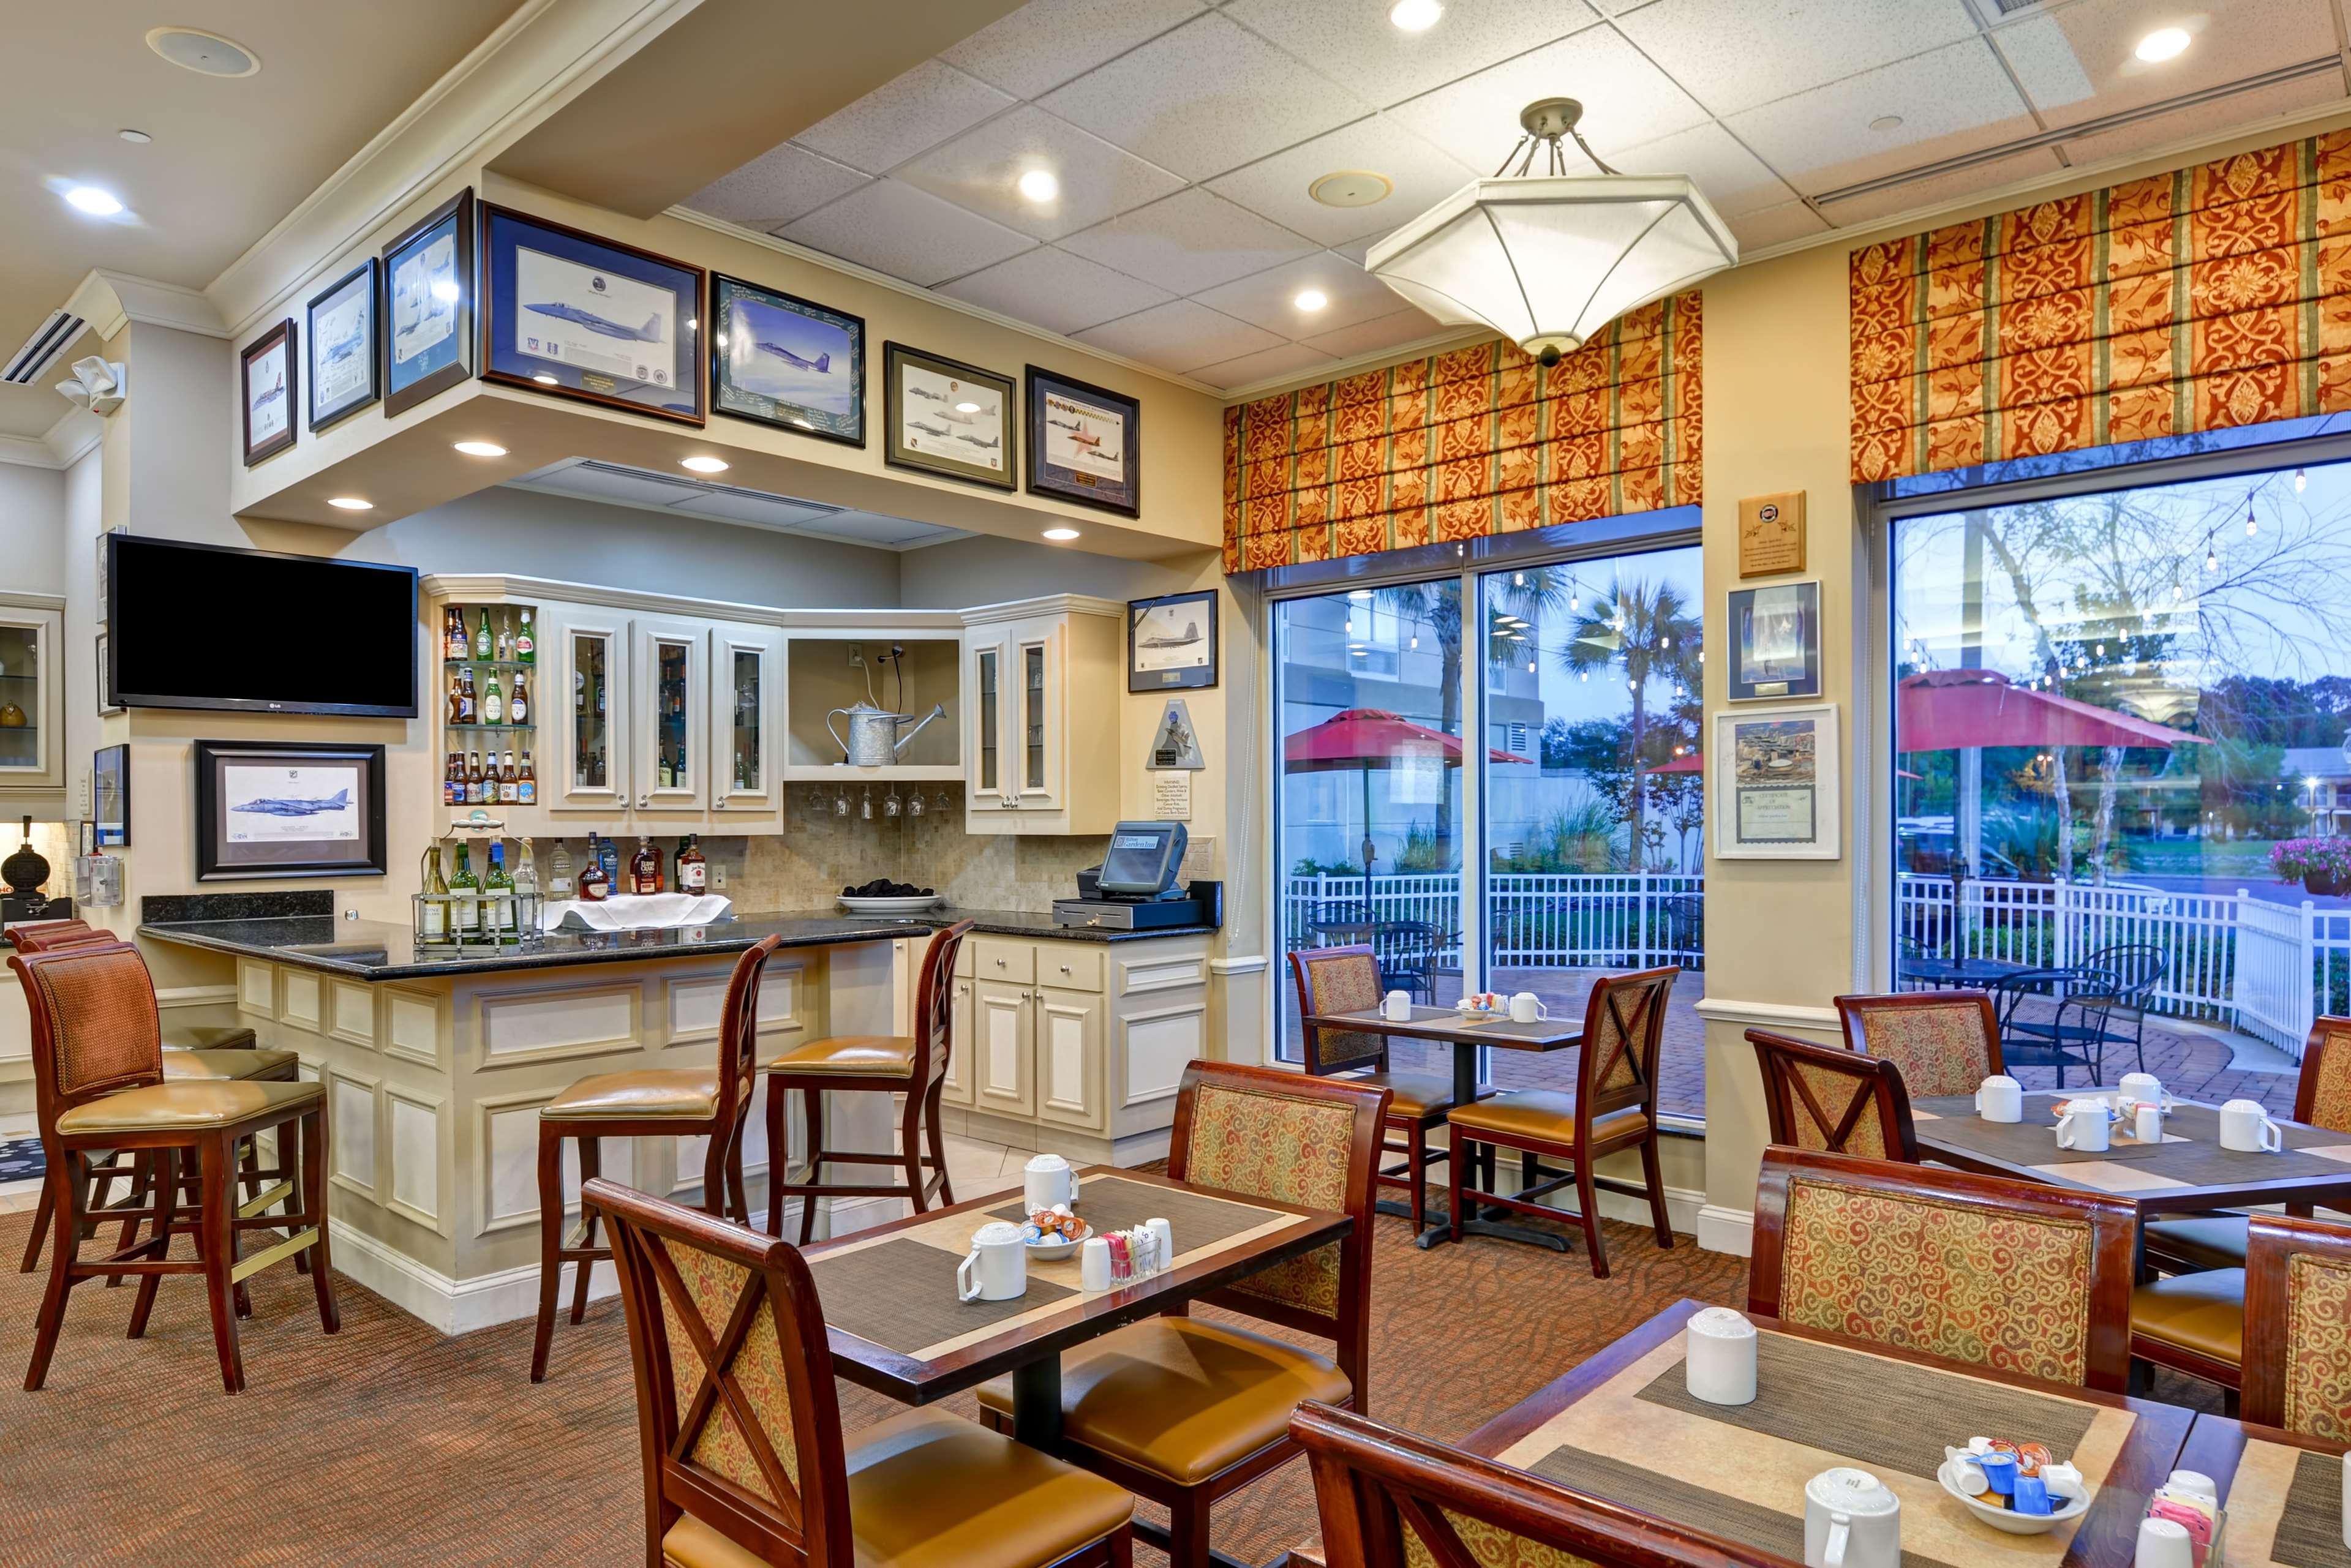 Hilton Garden Inn Panama City image 10